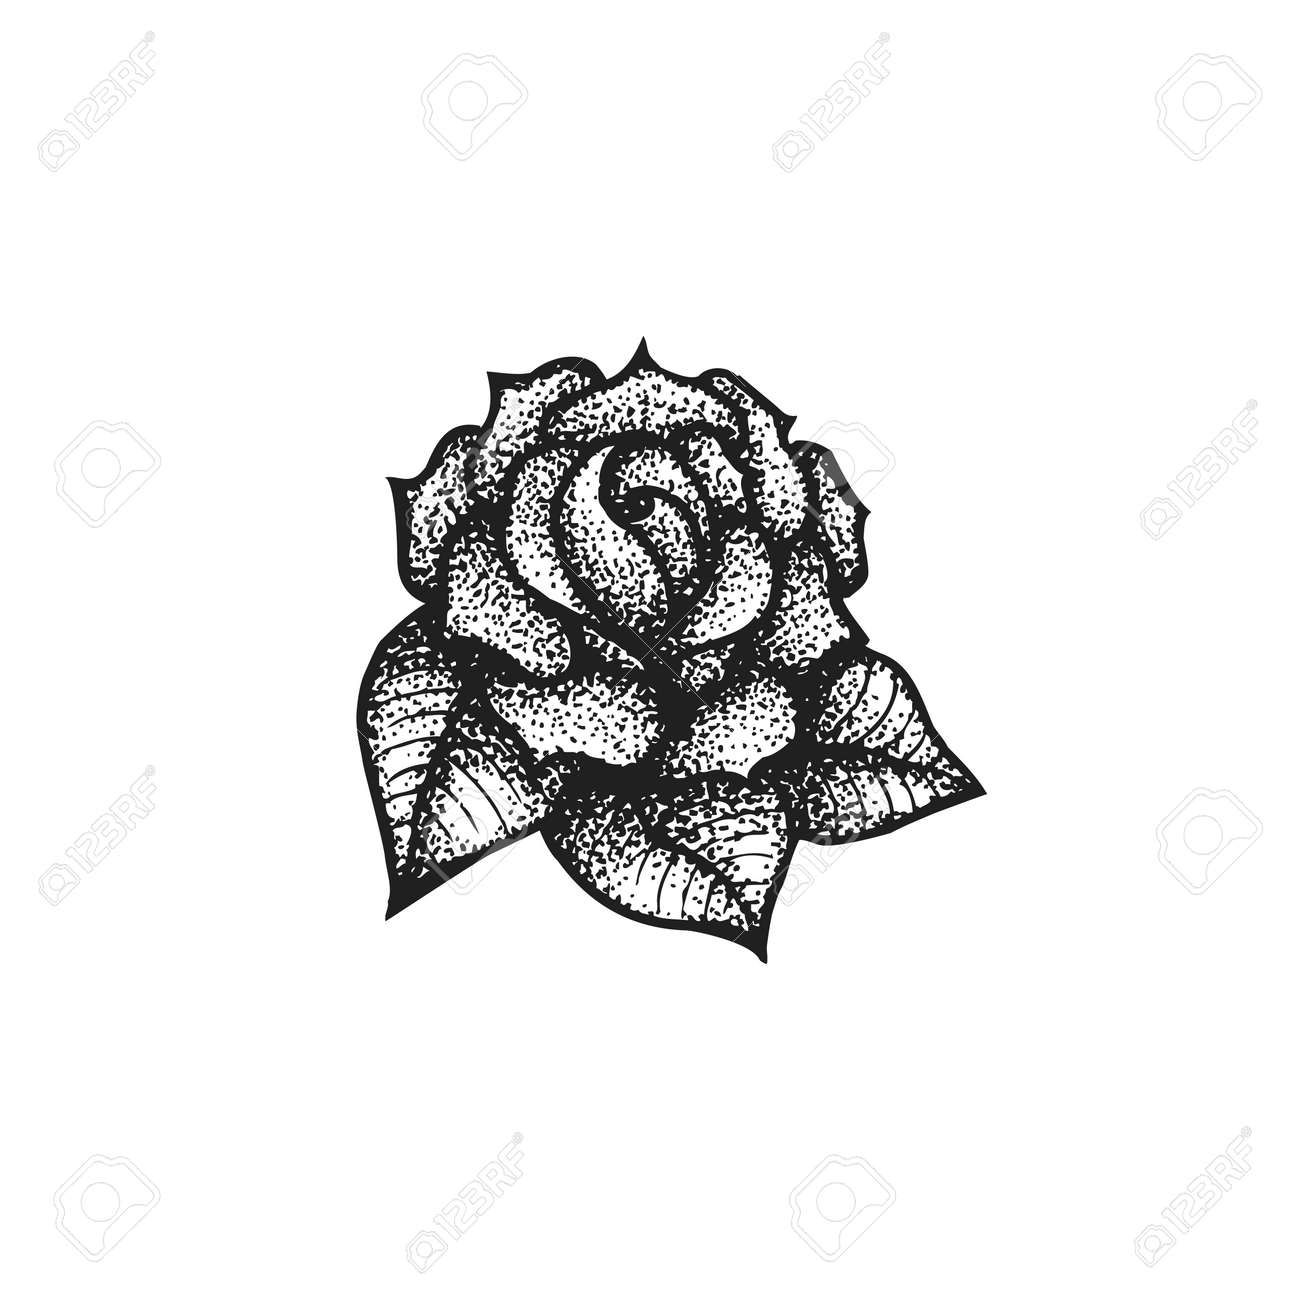 Vector vector black work tattoo dot art hand drawn engraving style vintage rose flower illustration isolated white background